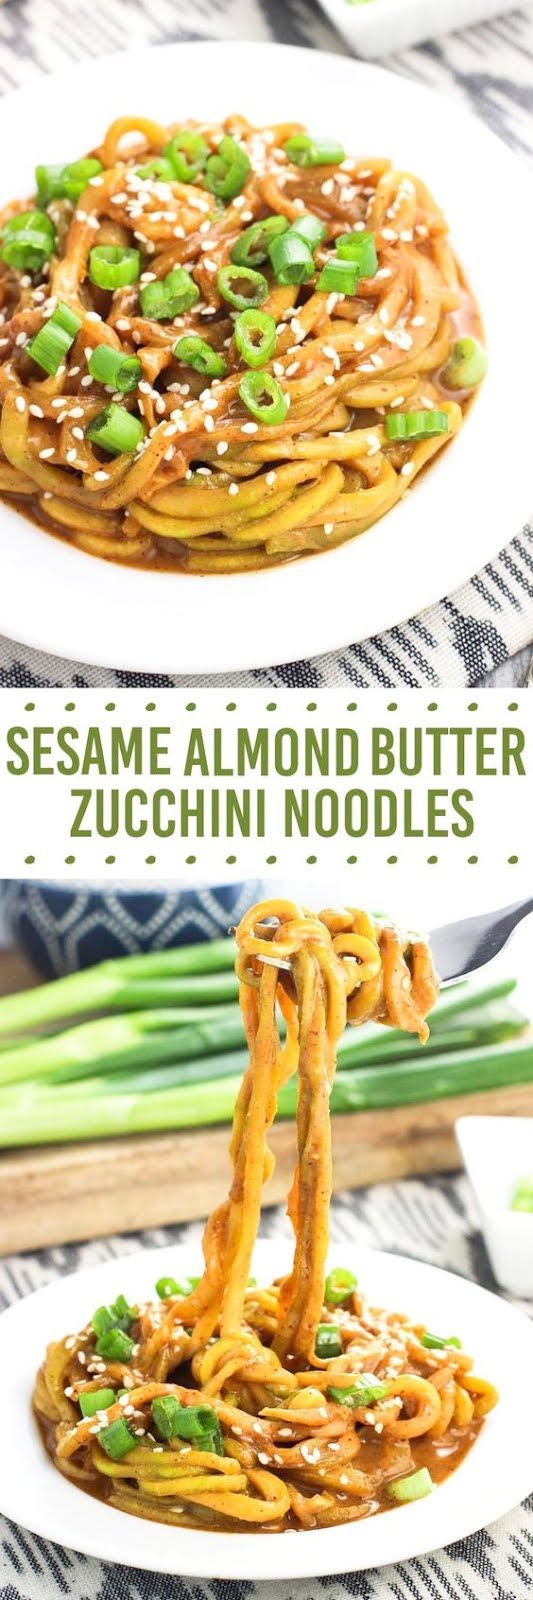 Sesame Almond Butter Zucchini Noodles